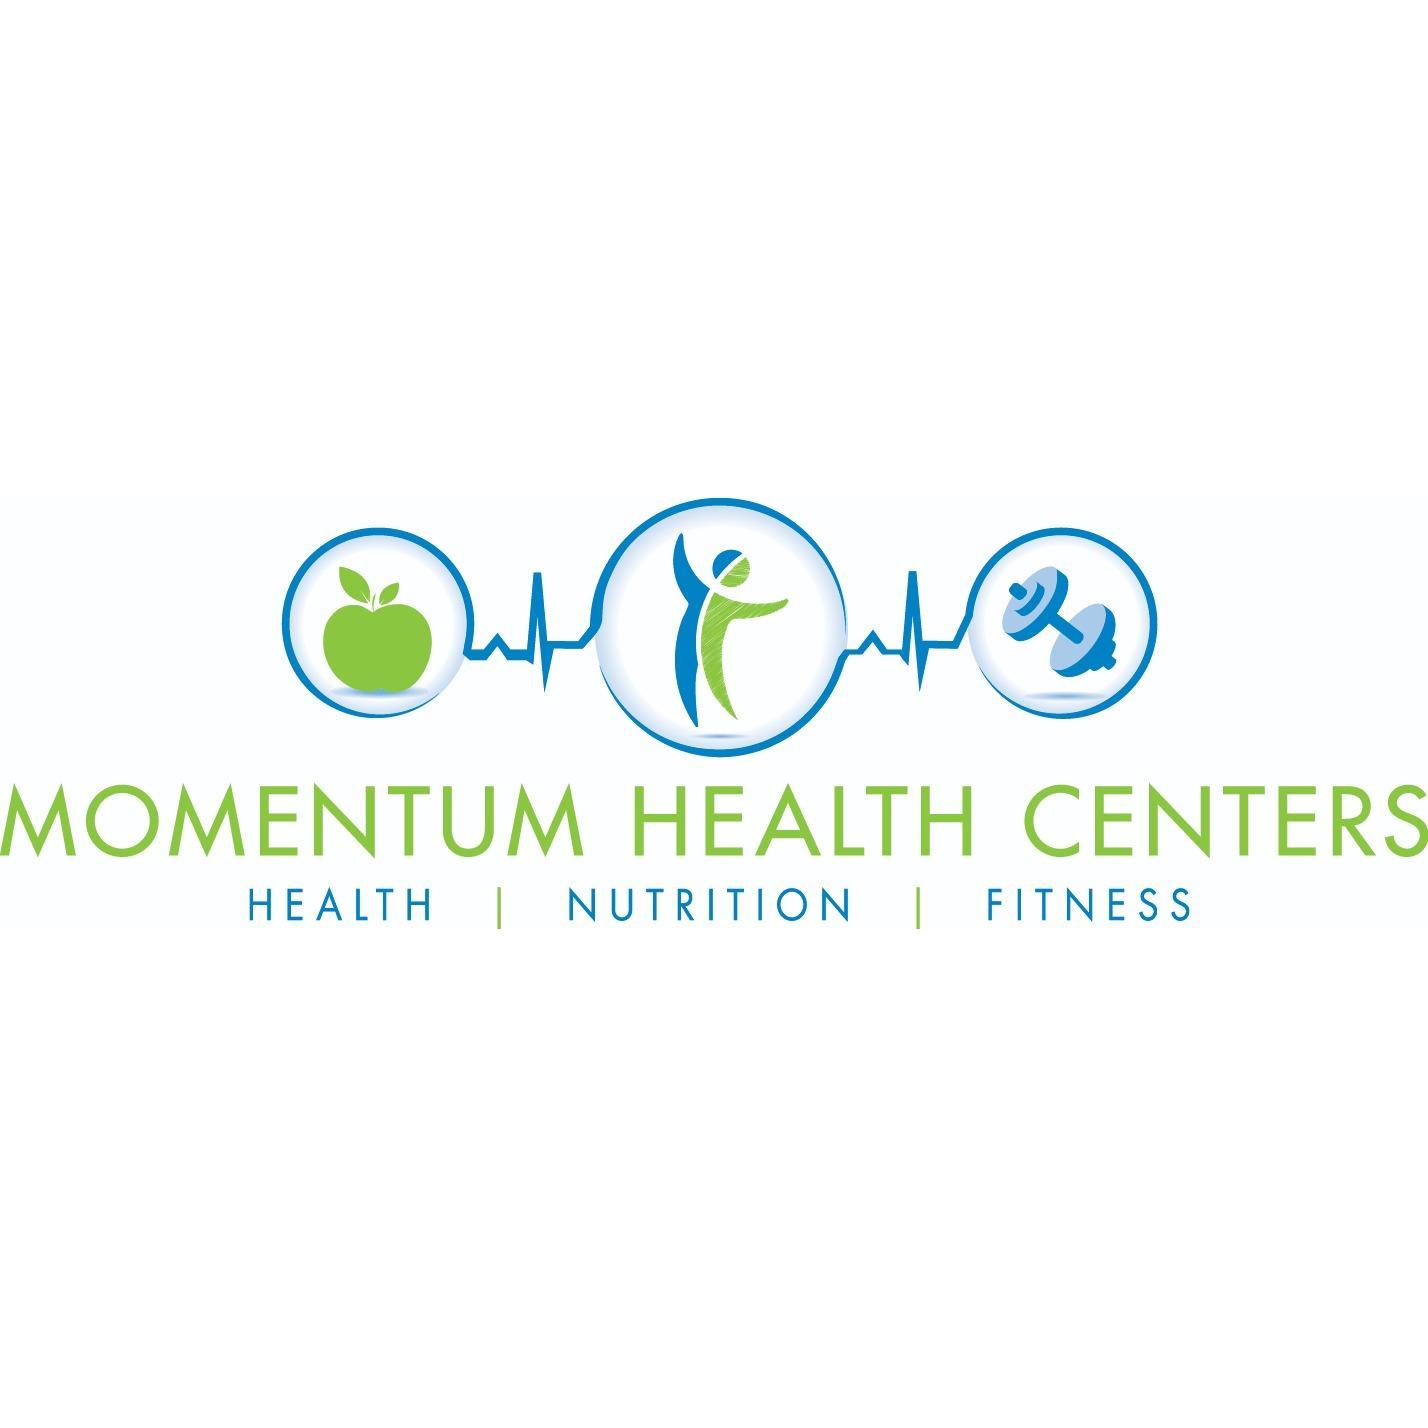 Momentum Health Centers, LLC